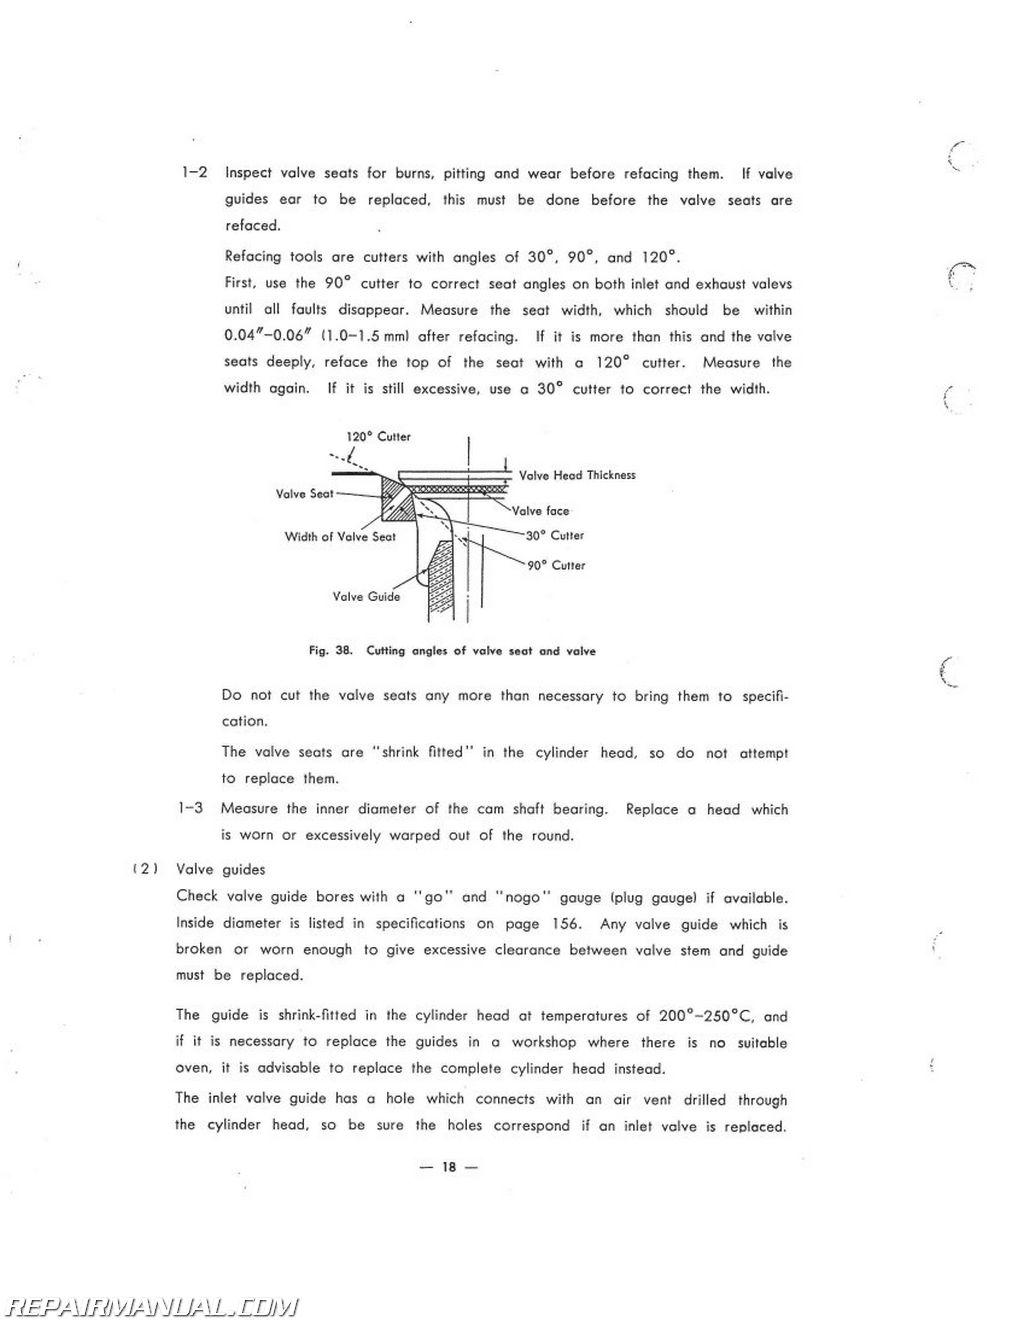 1959 1966 honda c92 cs92 cb92 c95 ca95 125 150cc motorcycle 1959 1966 honda c92 cs92 cb92 c95 ca95 125 150cc service manual page 2